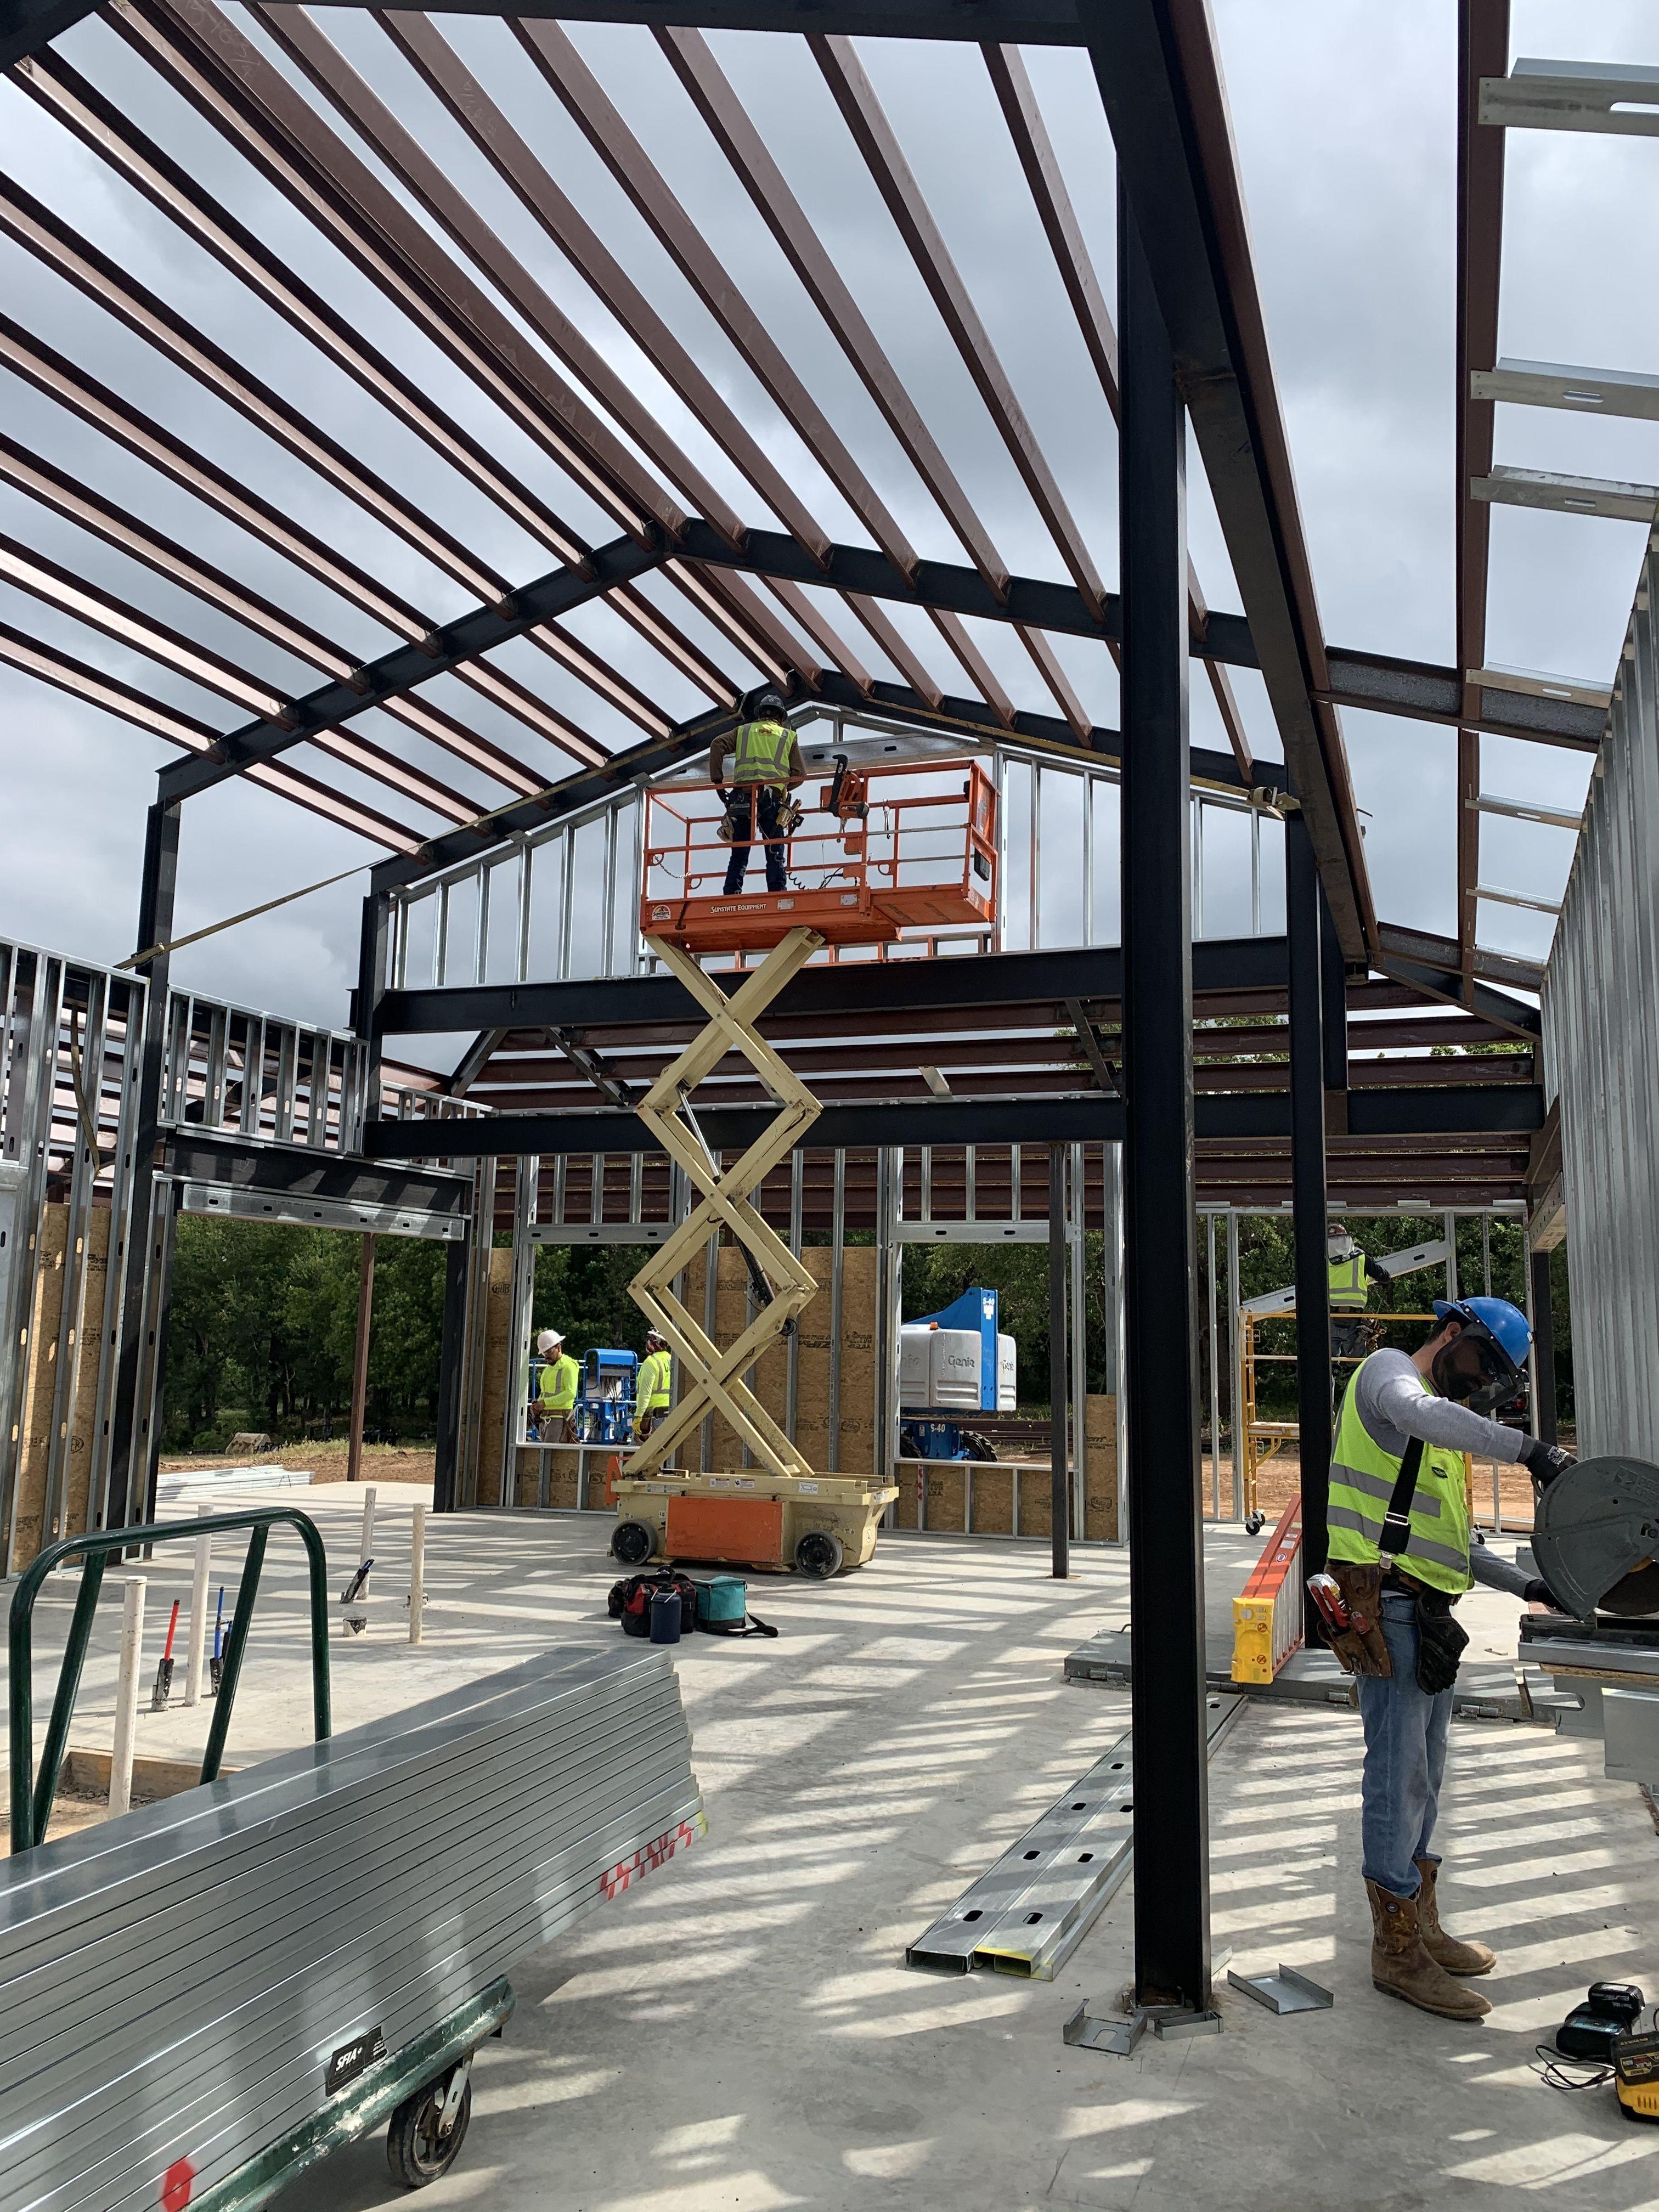 Pin de Brianleather en Building our dream home en 2020